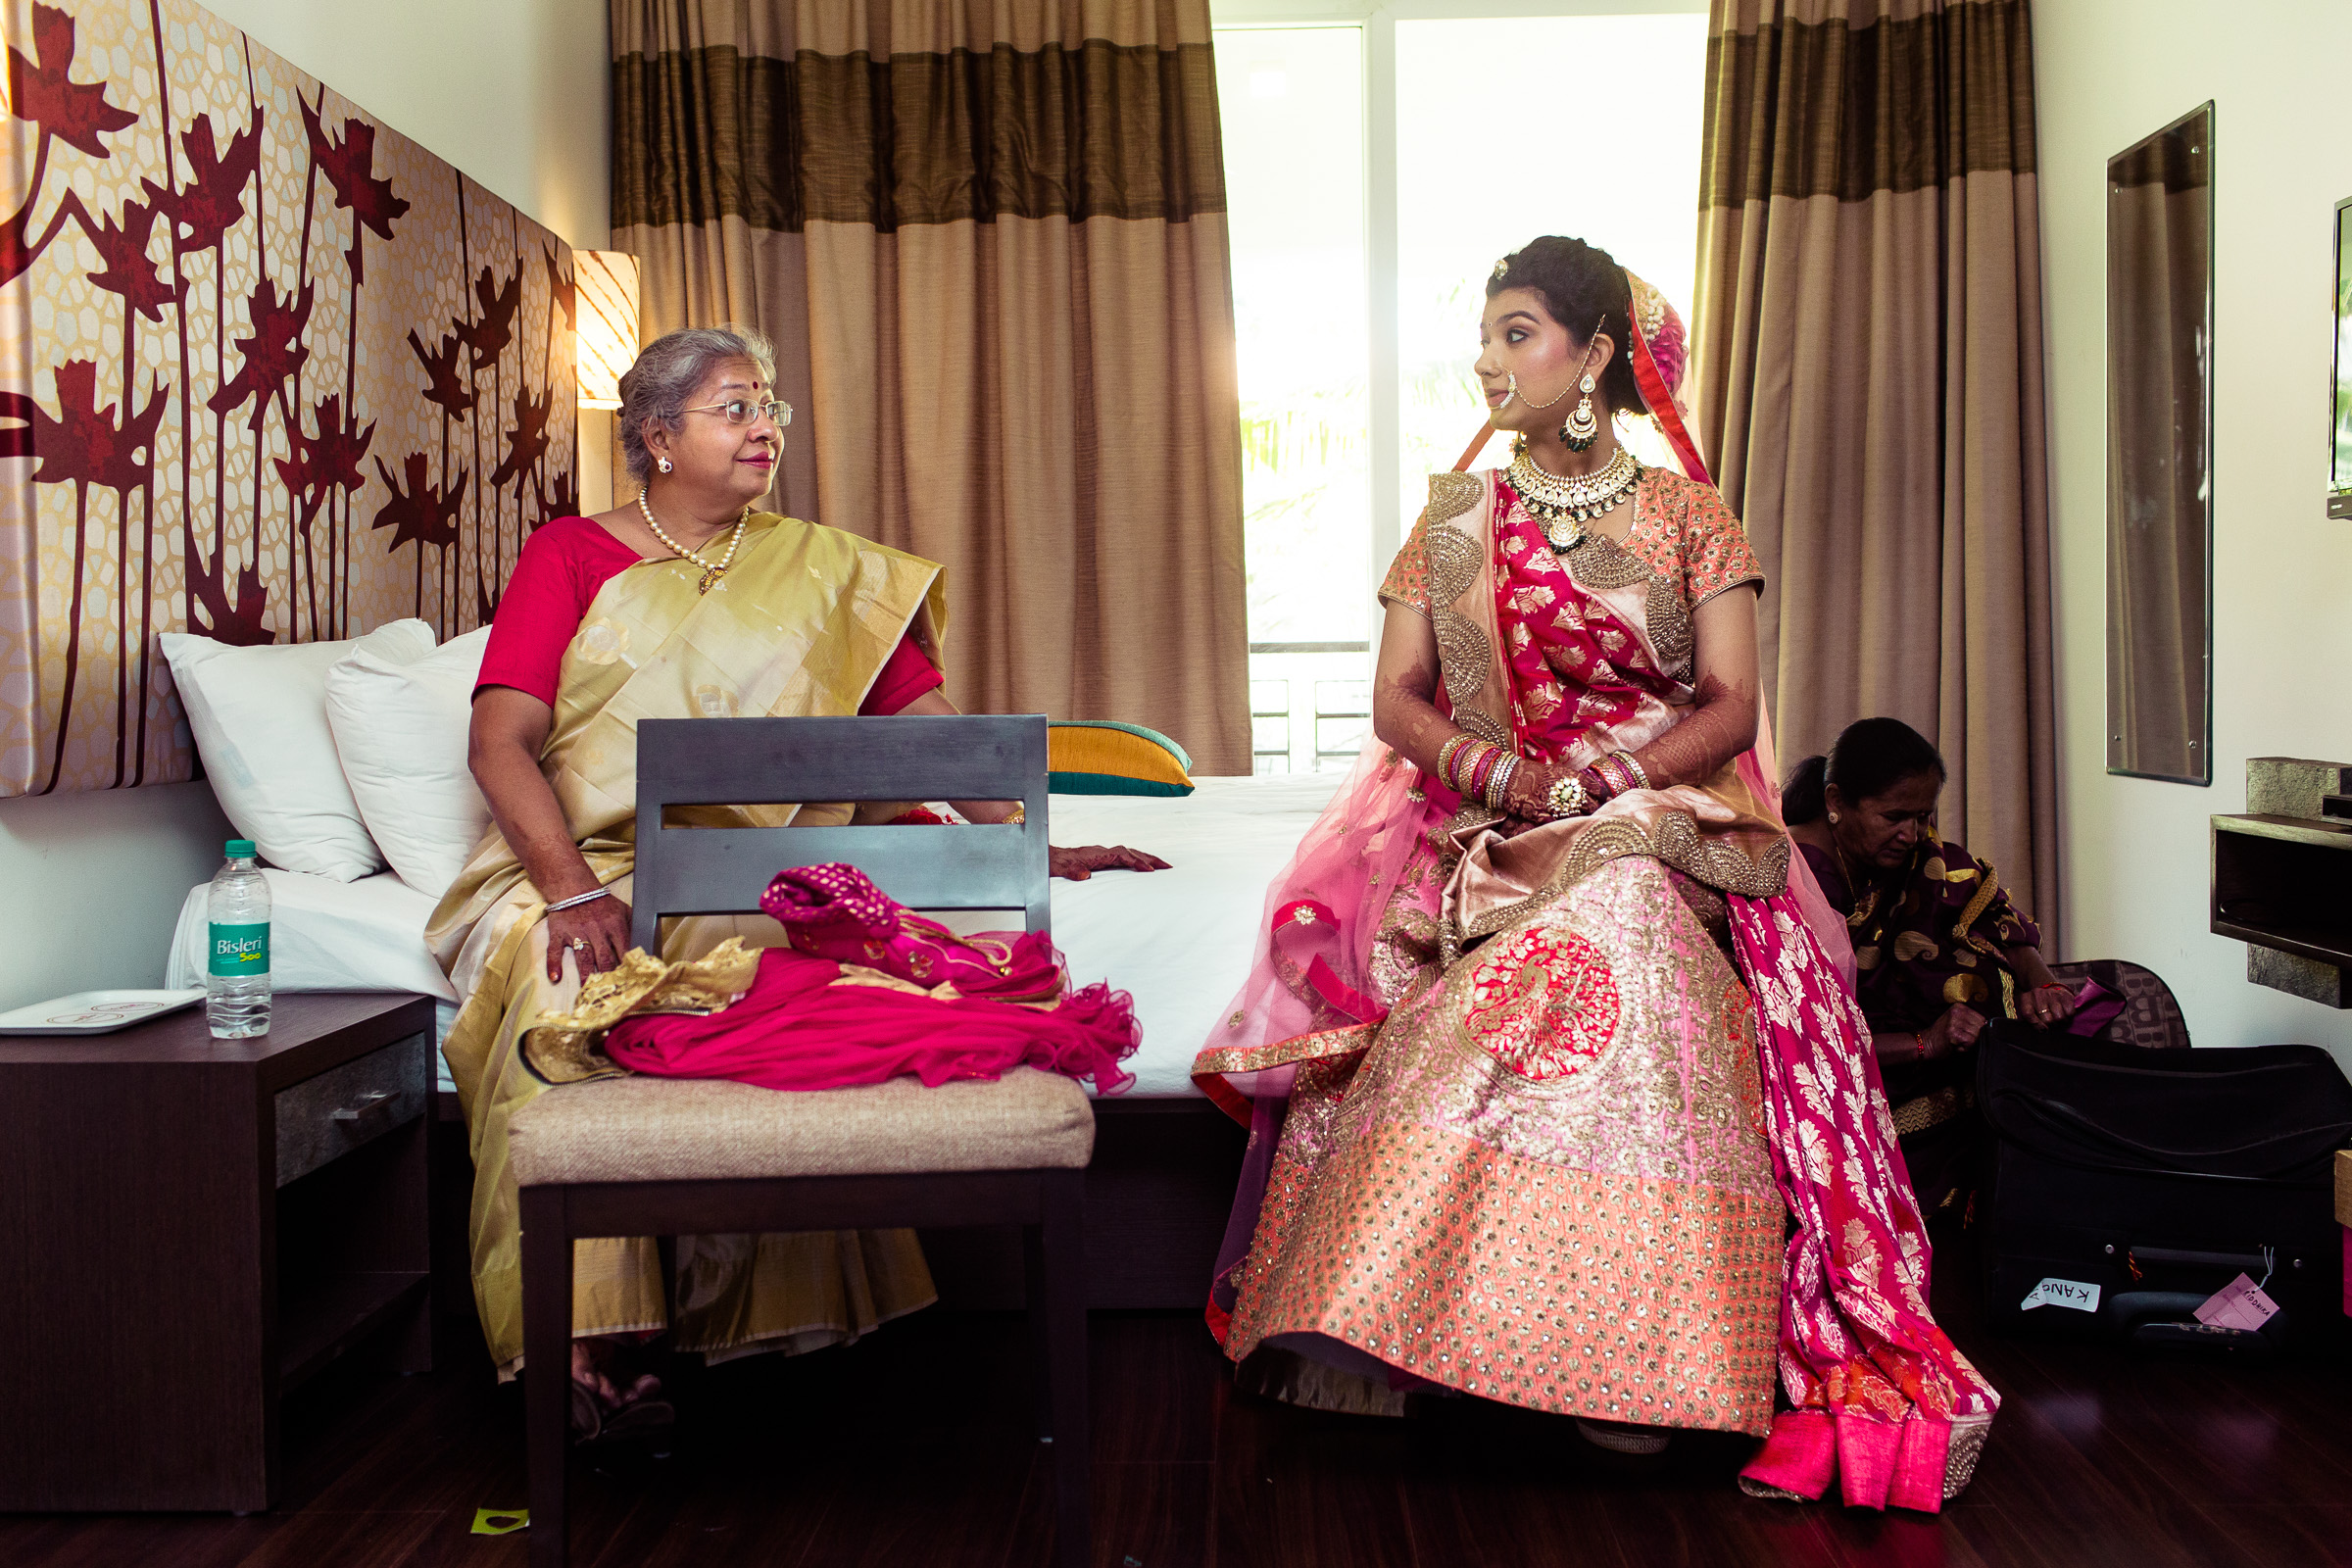 marwari-candid-wedding-photographers-bangalore-0010.jpg